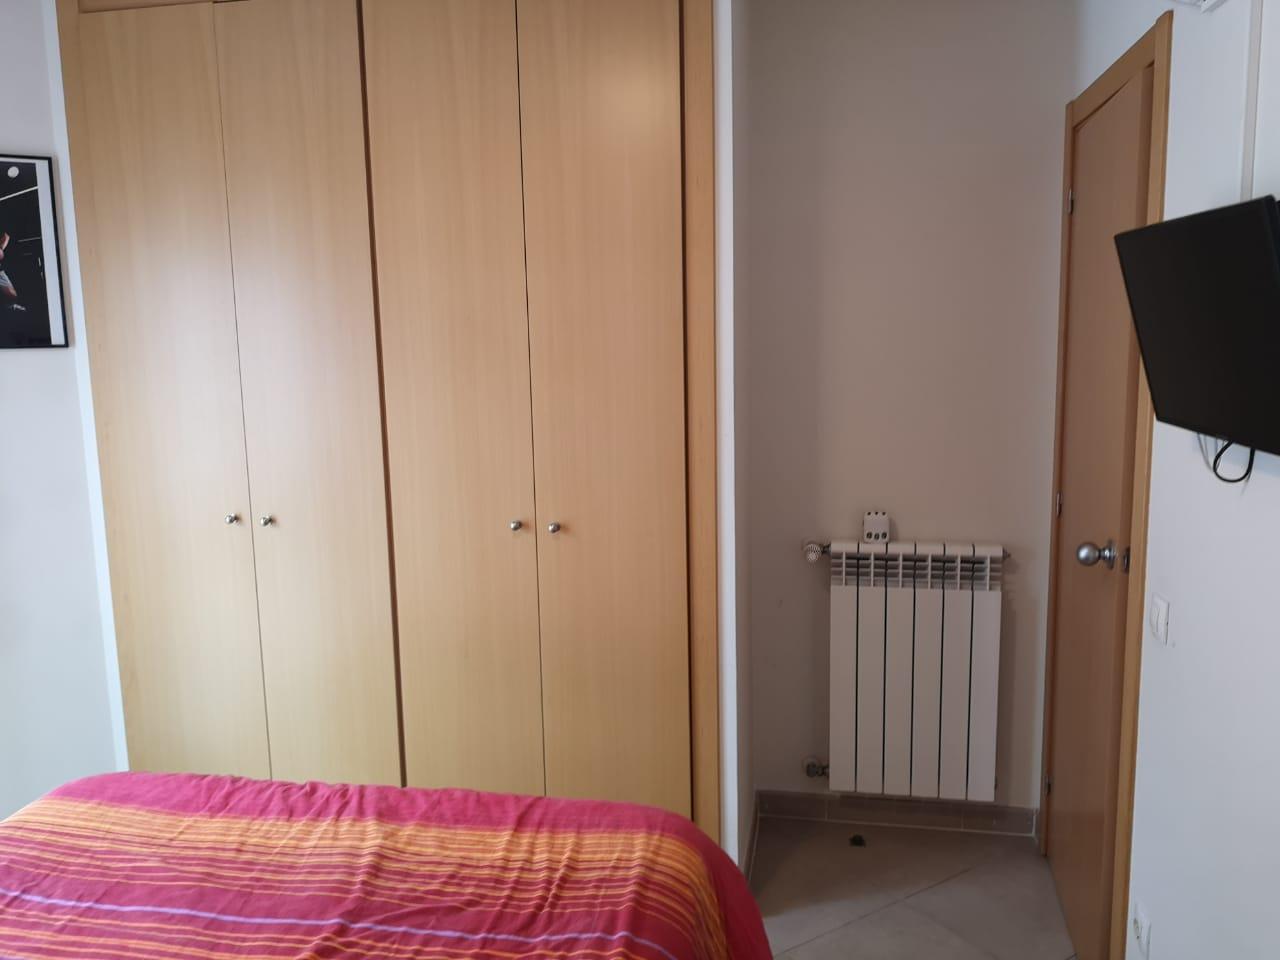 Pis en venda a Santa Coloma, 2 habitacions, 73 metres